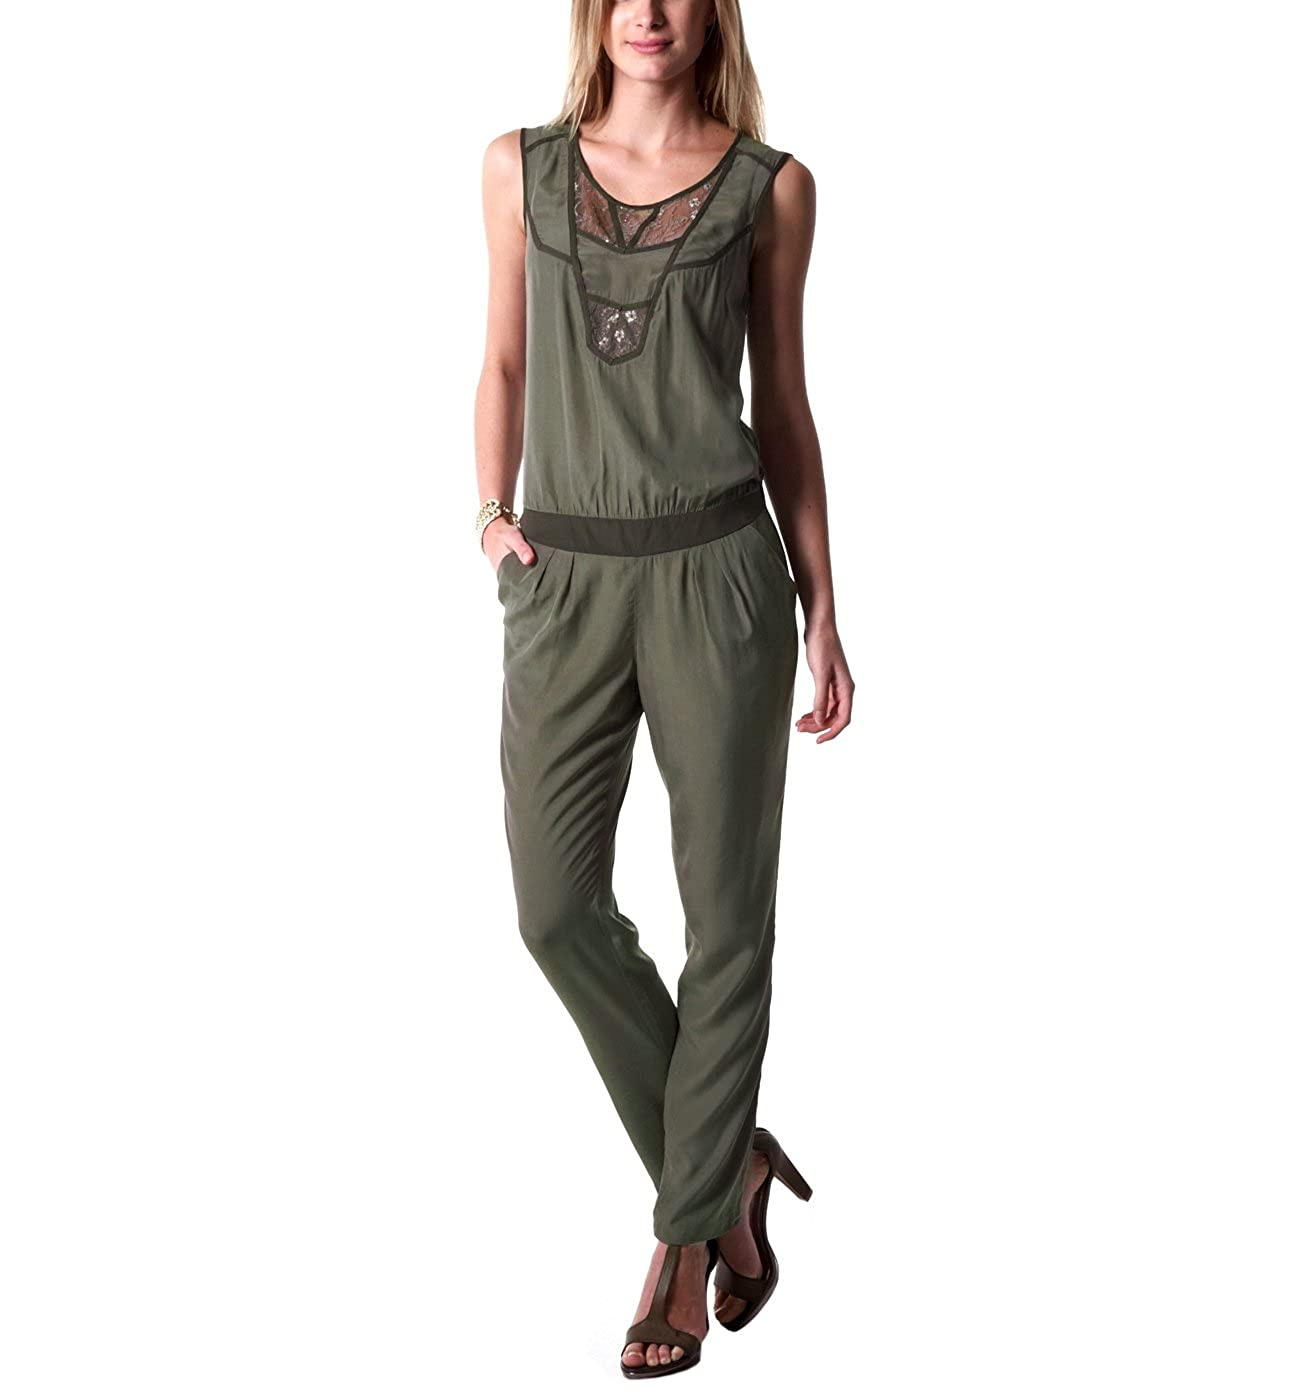 a9dc01aa0e3659 Promod Combinaison-pantalon femme Kaki 40: Amazon.fr: Vêtements et ...